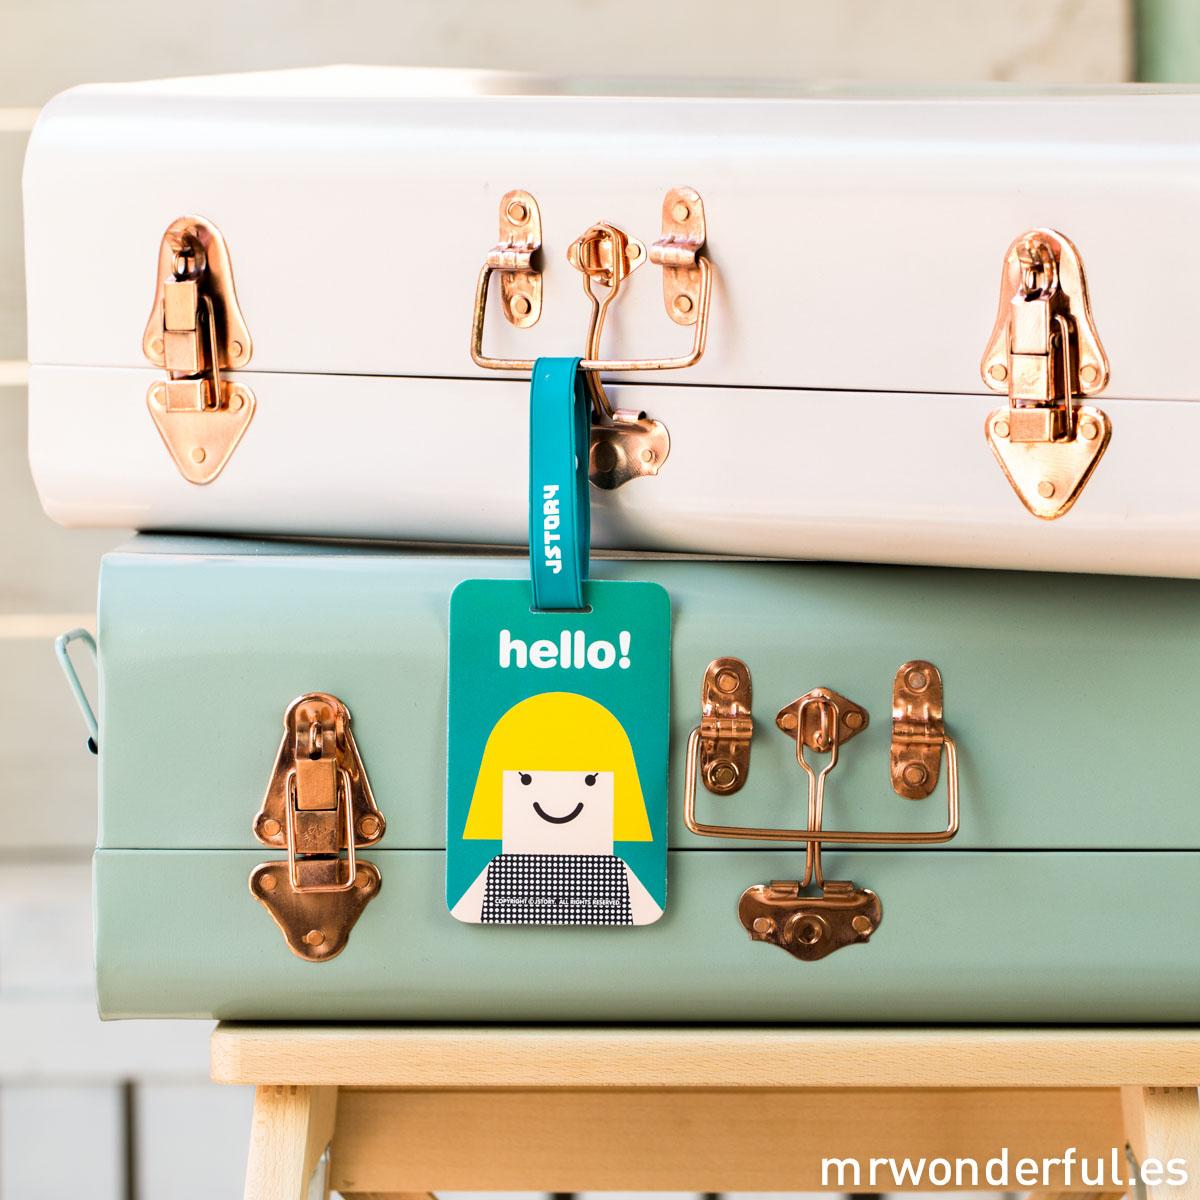 mrwonderful_214082_etiqueta-viaje-equipaje-señora-1